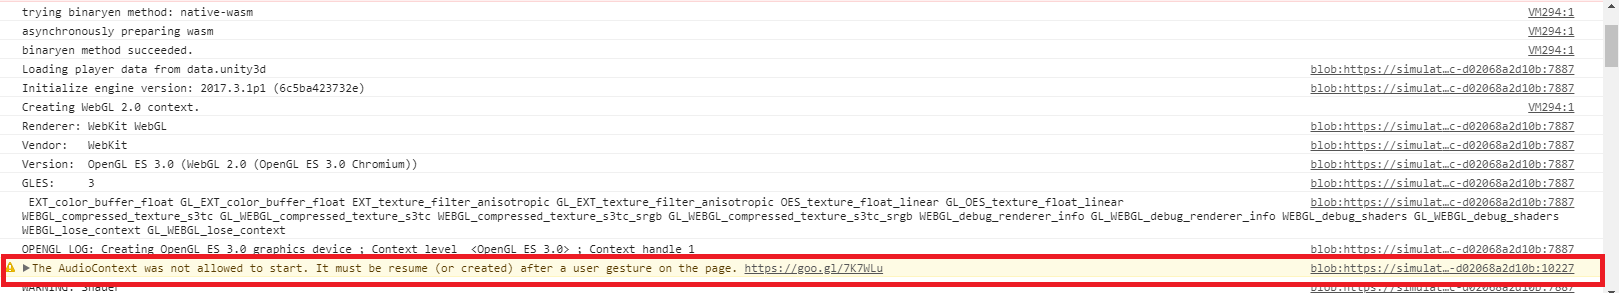 chrome_blocking_audio.png